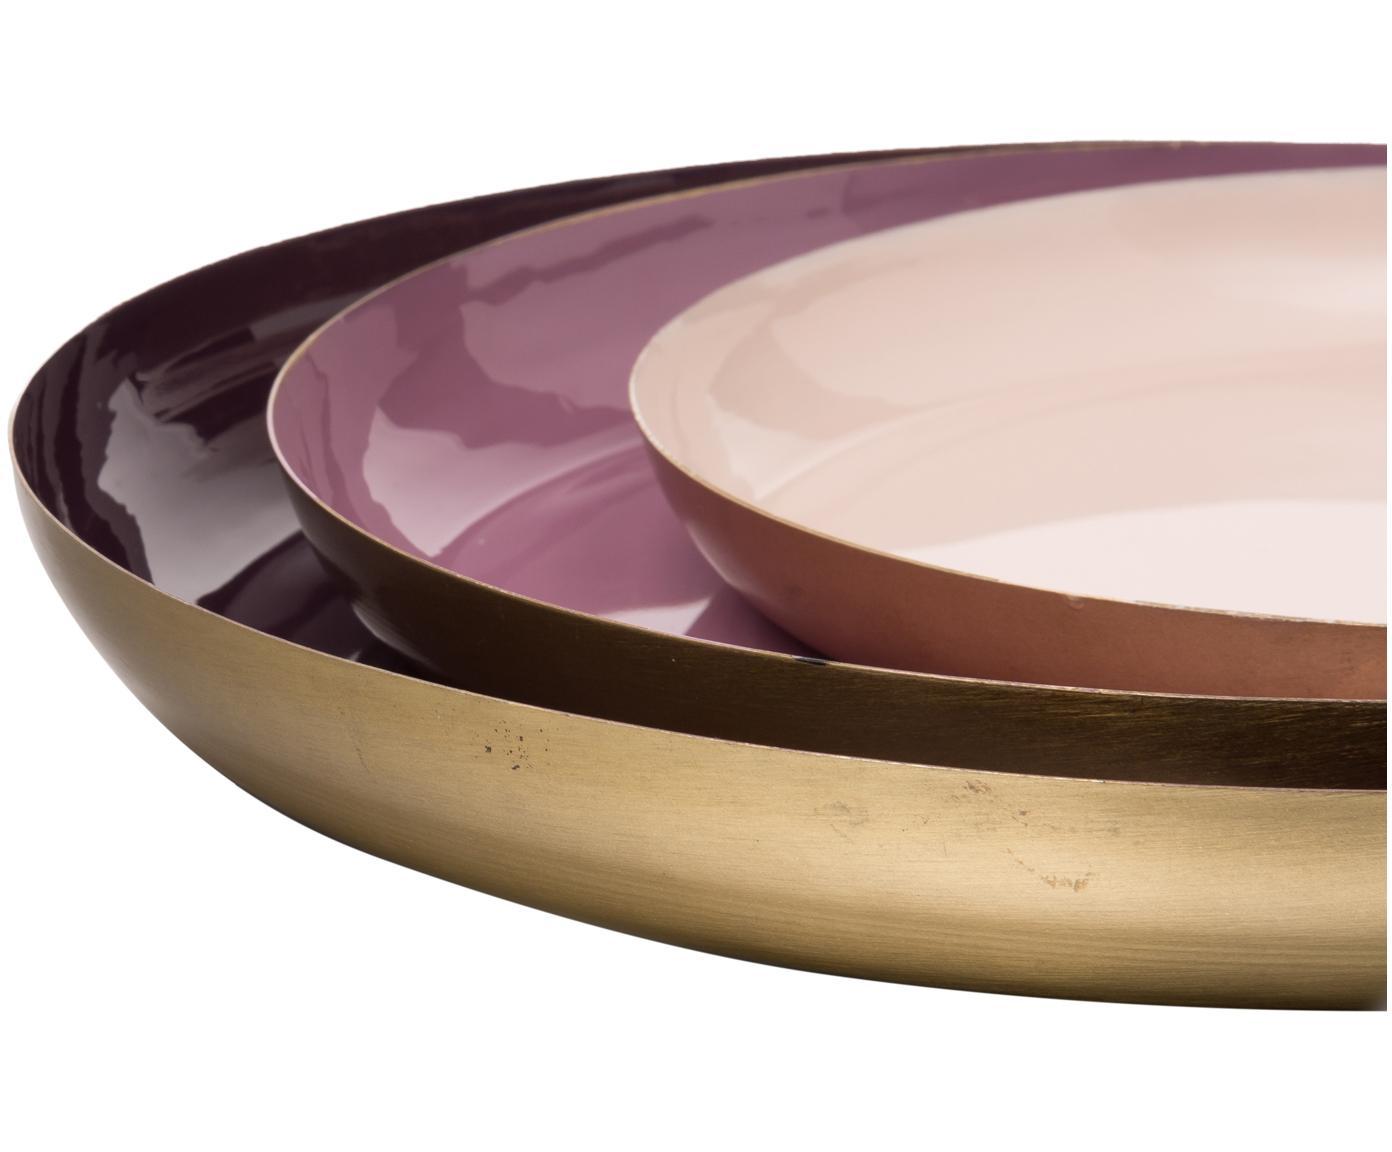 Set de bandejas decorativa Minella, 3pzas., Metal, pintado, Lila, rosa fuerte, rosa palo Exterior: dorado, Tamaños diferentes